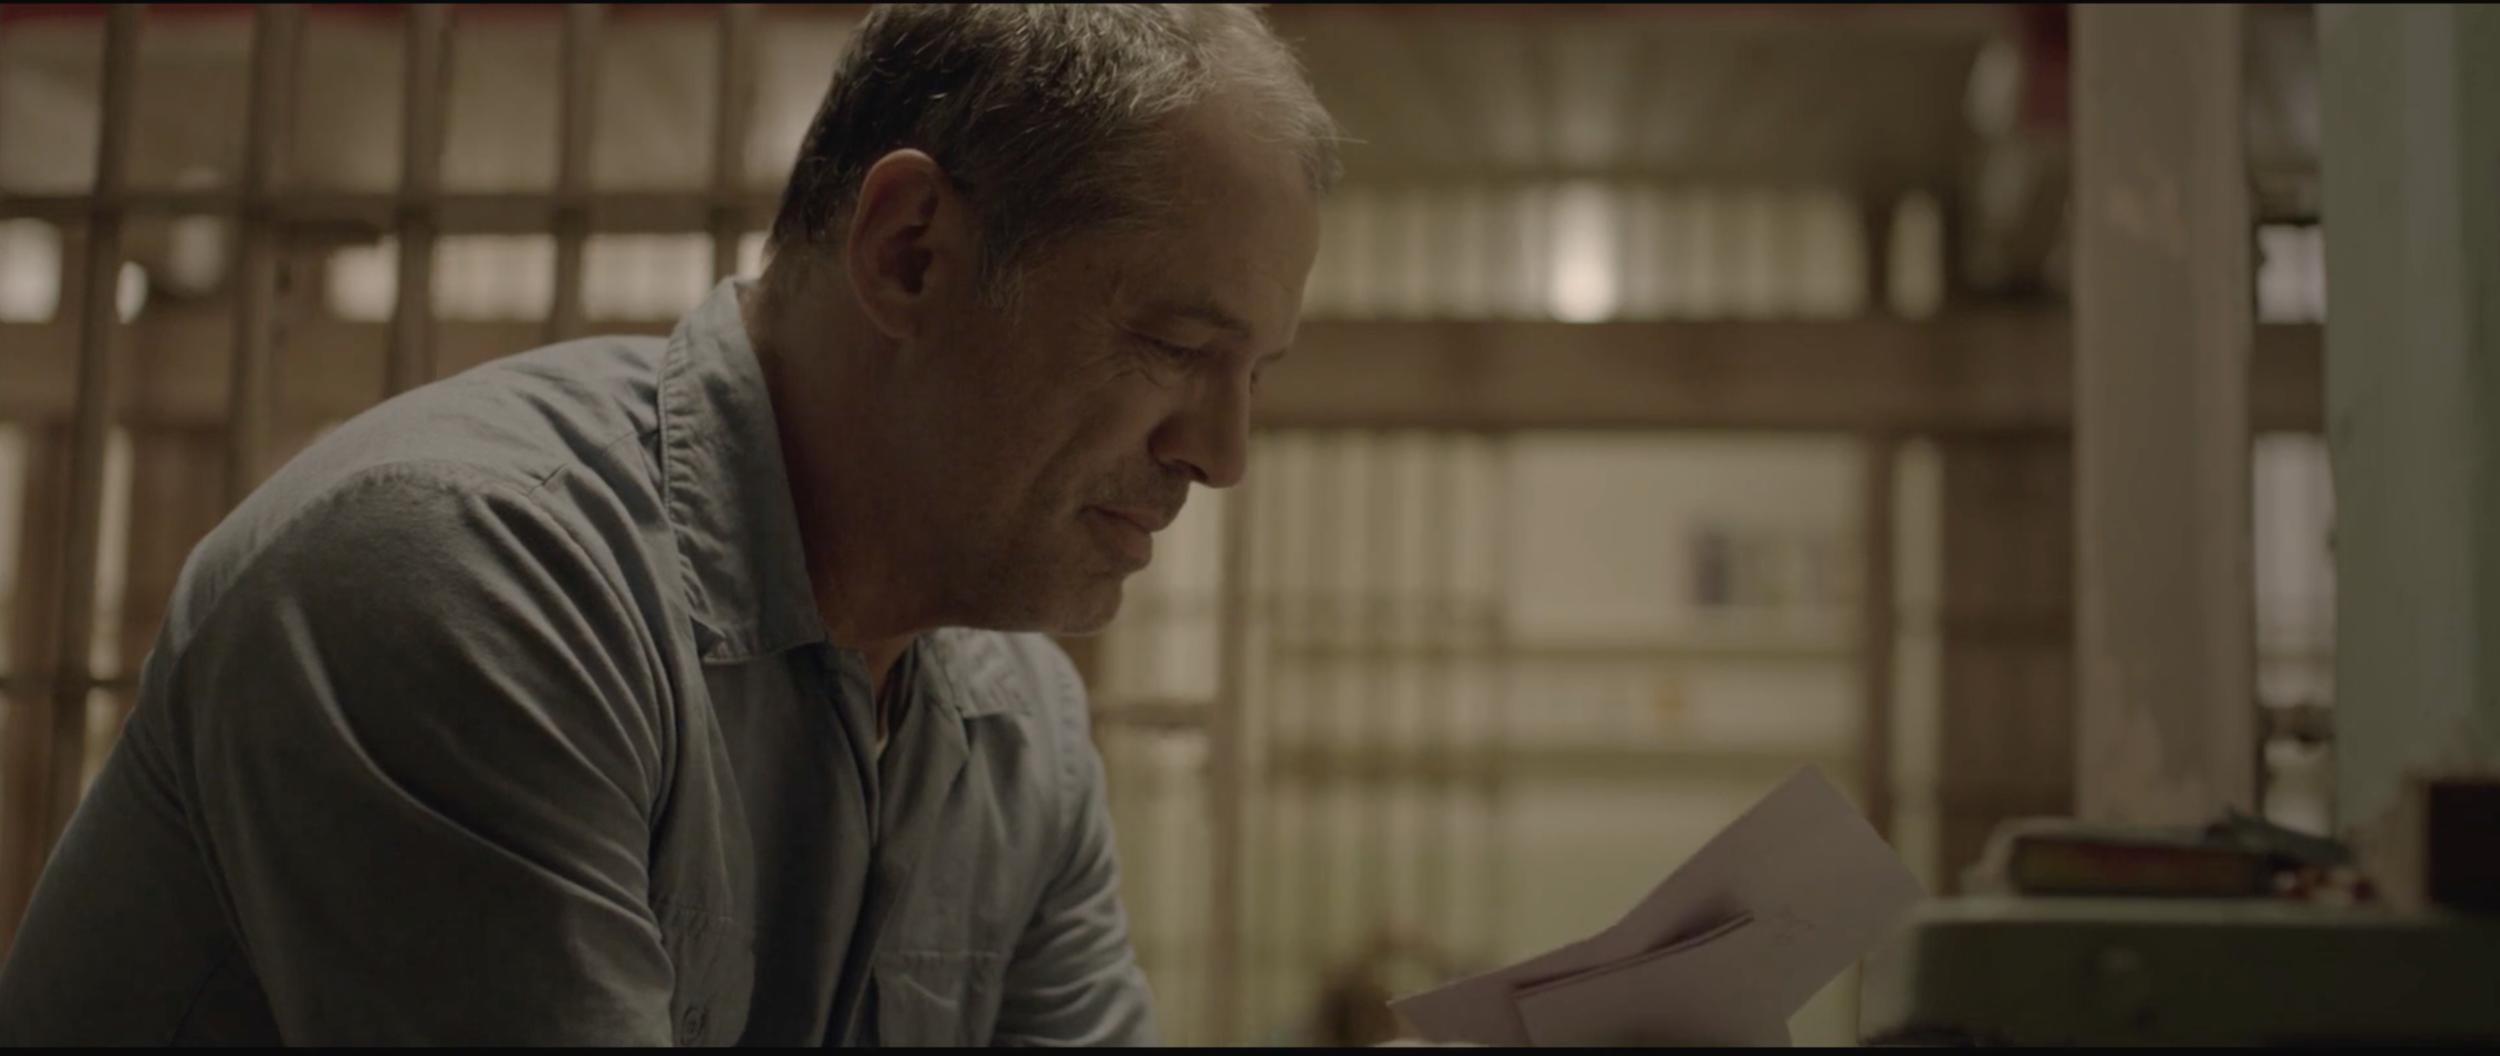 Actor Chuck McCollum as Tony, in his cell at Alcatraz.